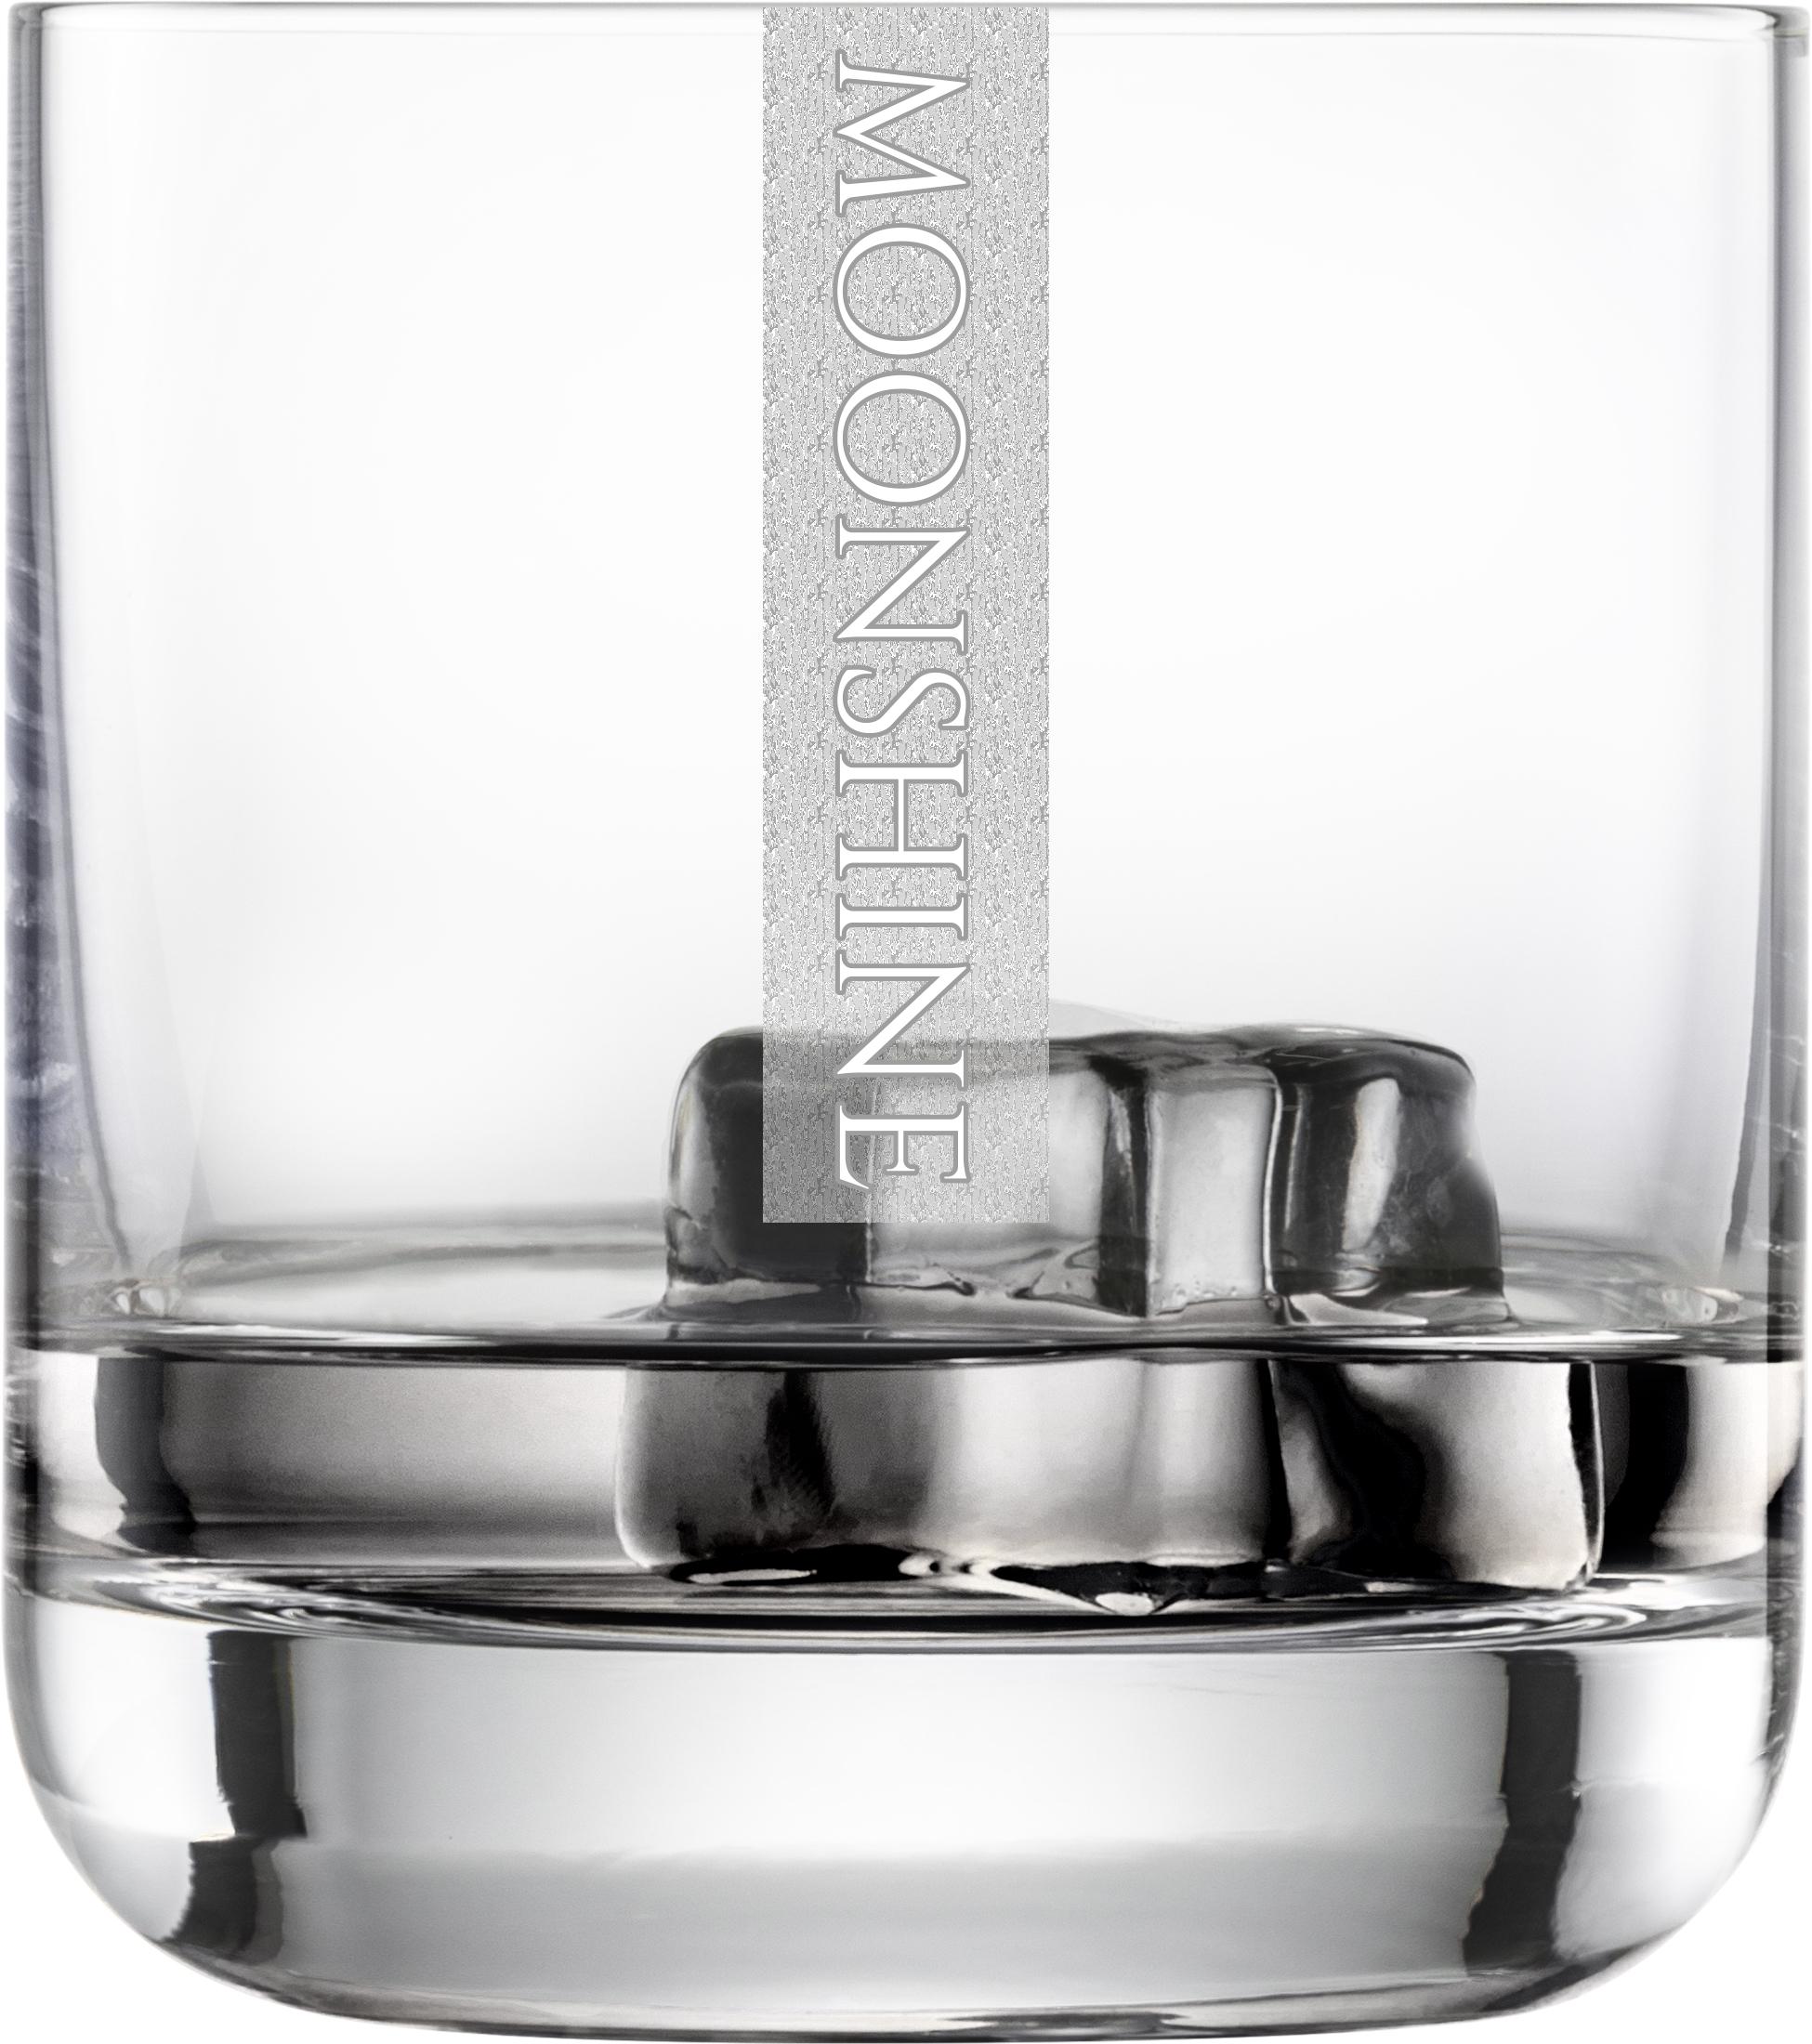 MOONSHINE Gläser | 6 Stück 300ml Schott Tumblerglas | CoolGlas